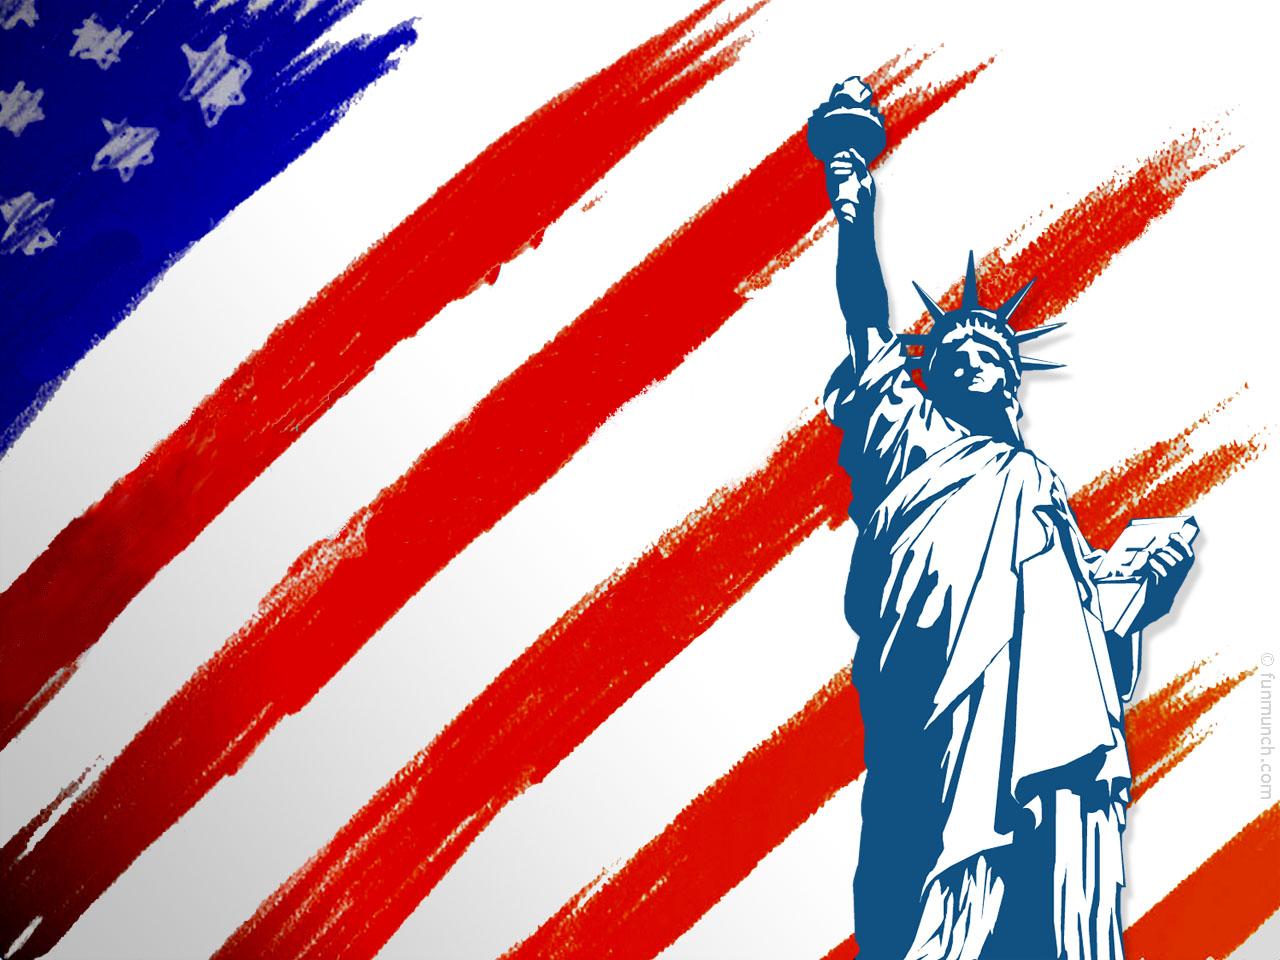 Patriotic Backgrounds wallpaper Patriotic Backgrounds hd wallpaper 1280x960